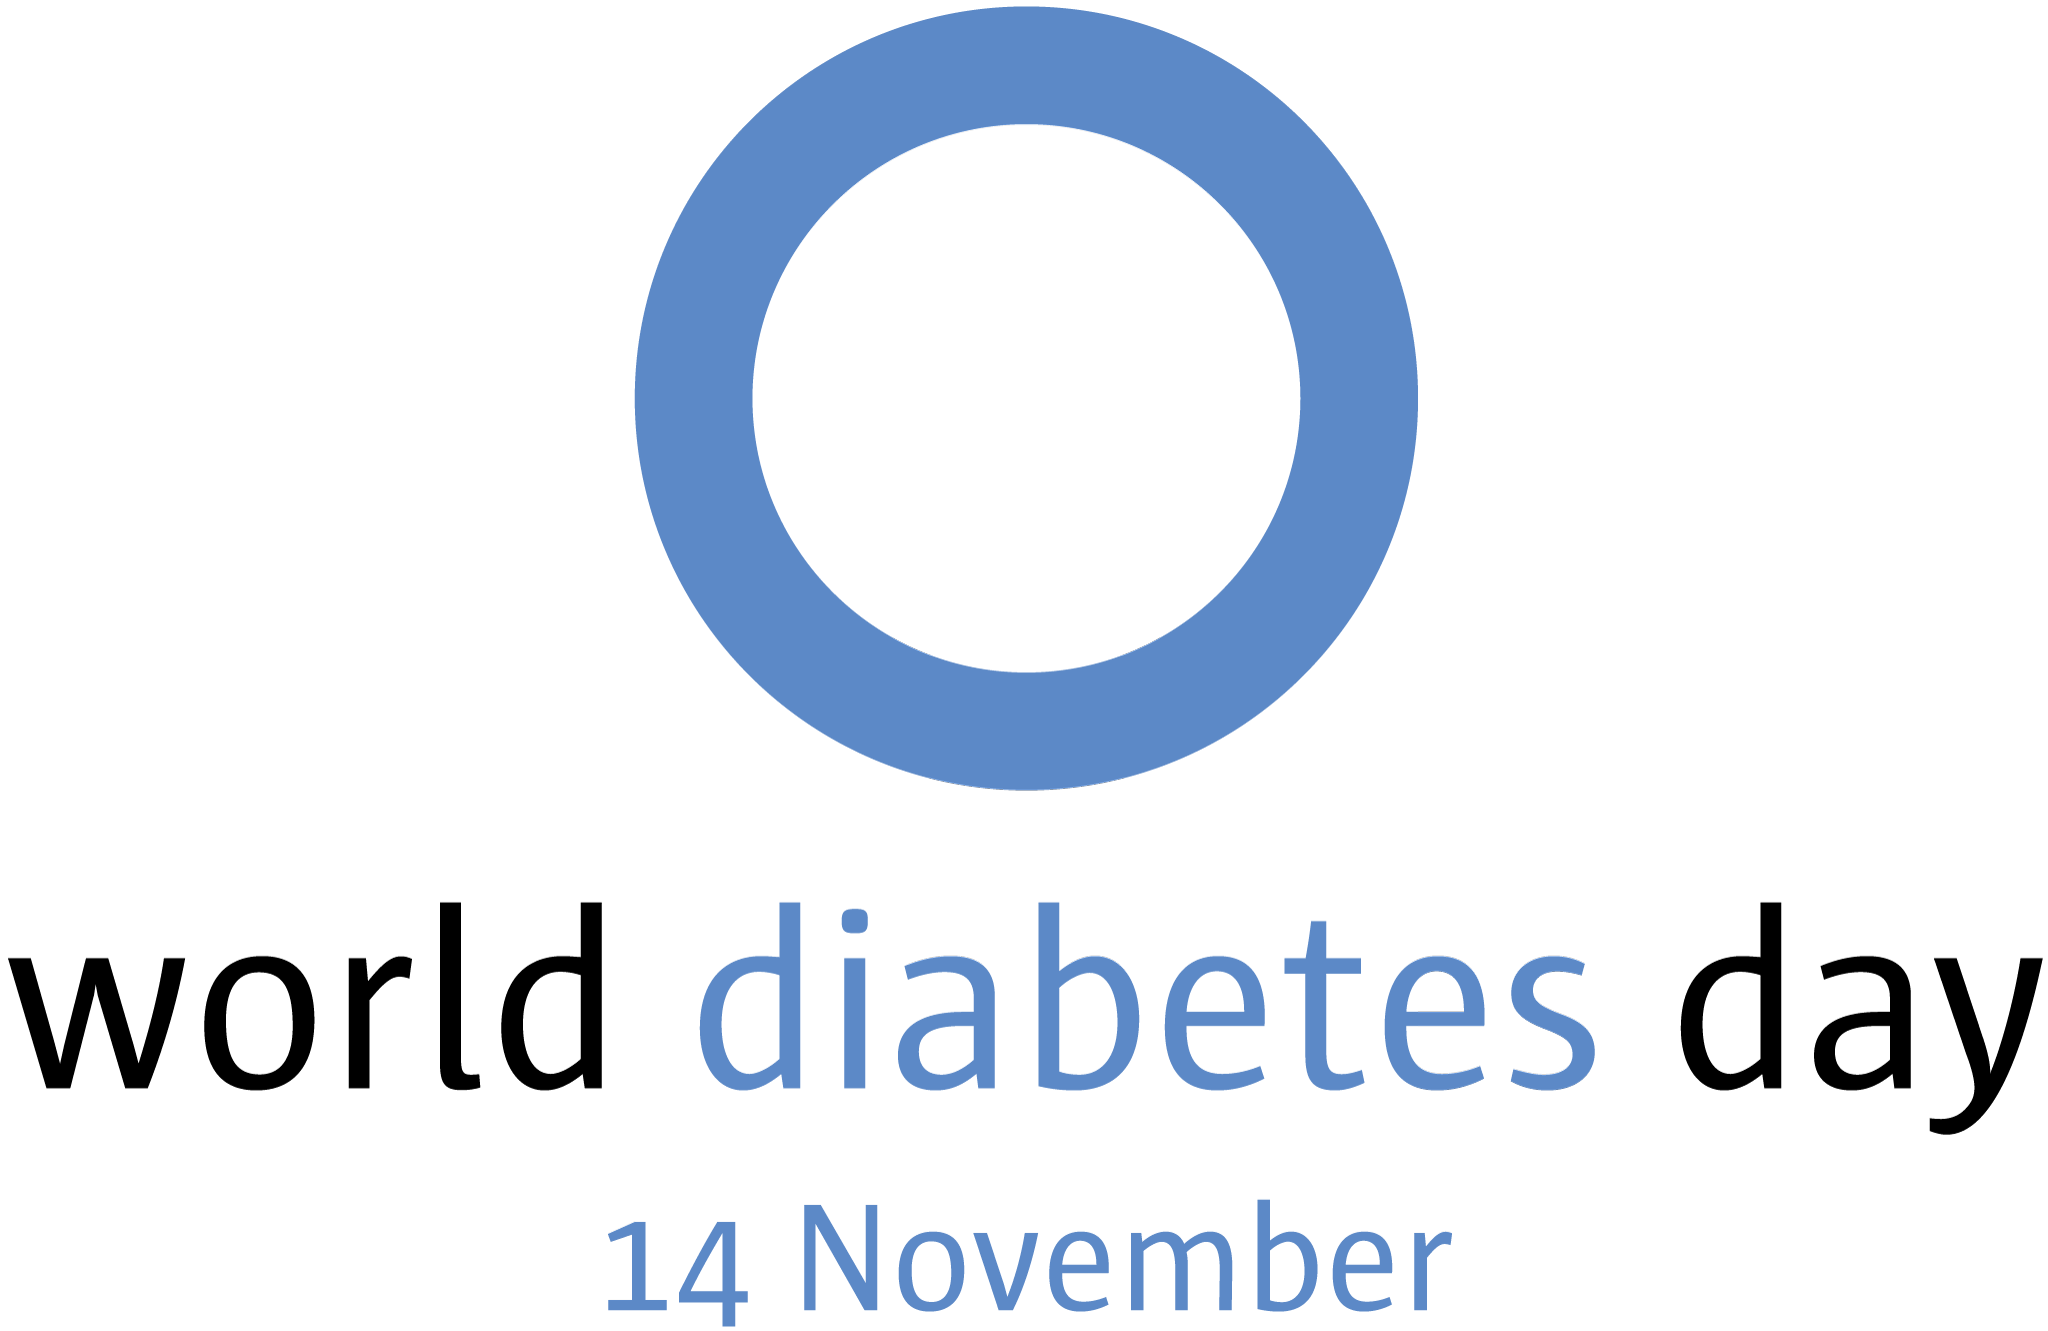 World Diabetes Day Logo, World Diabetes Day is on November 14th